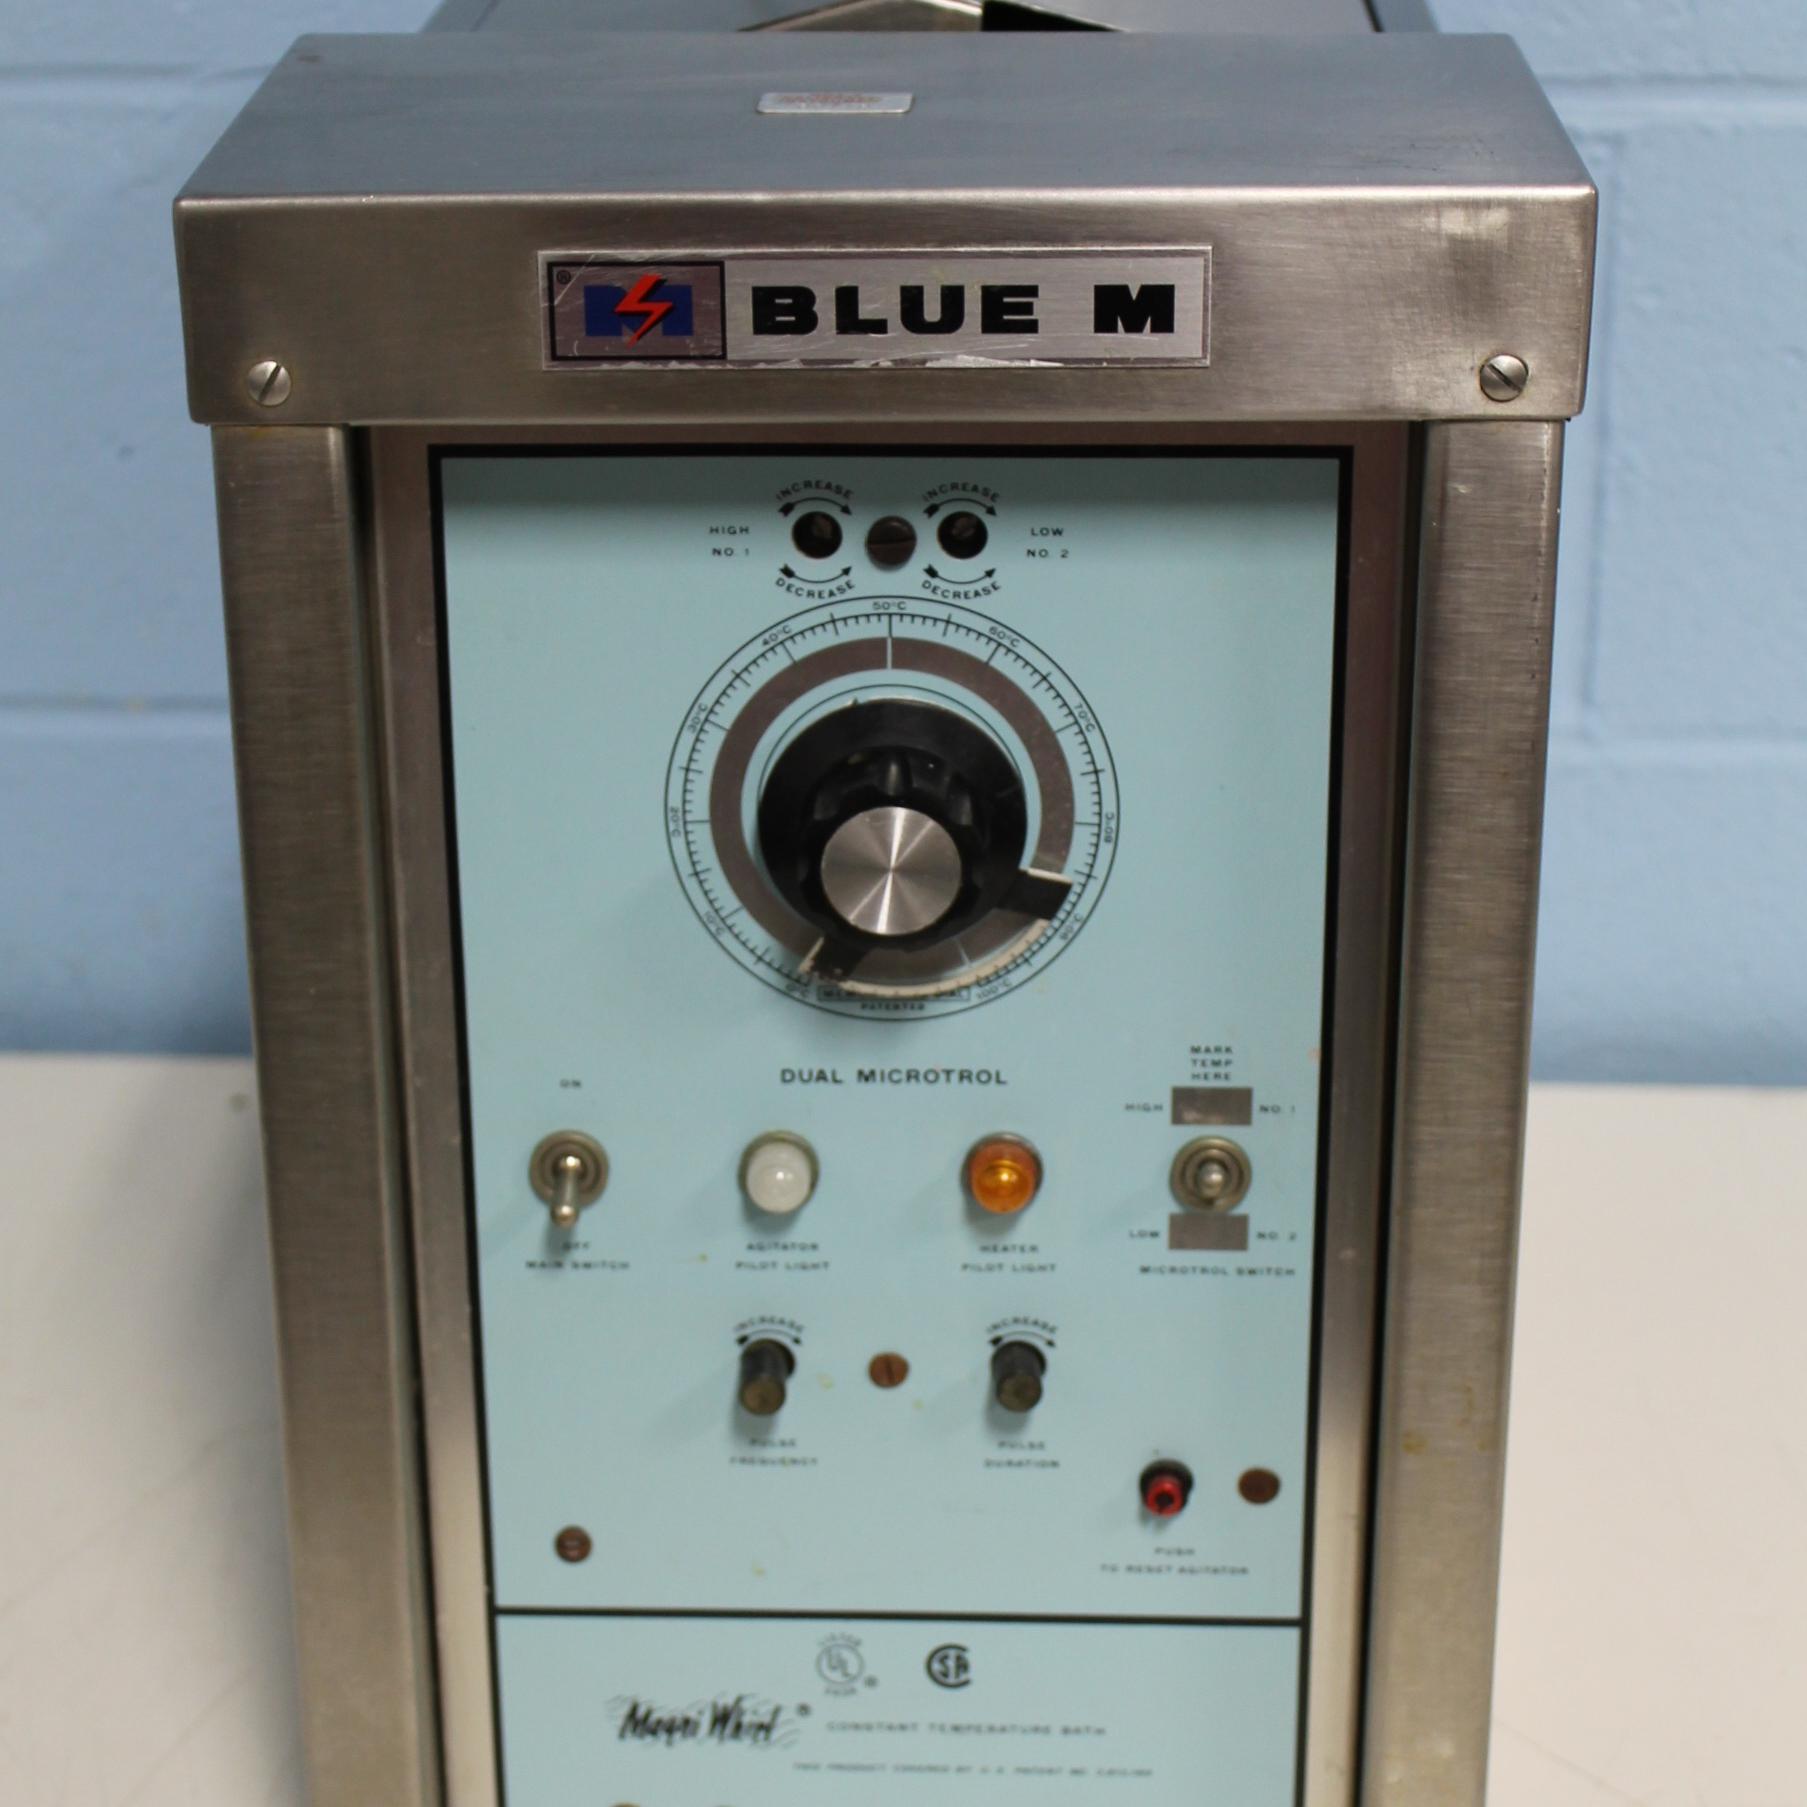 Blue M Magni Whirl Constant Temperature Bath Image